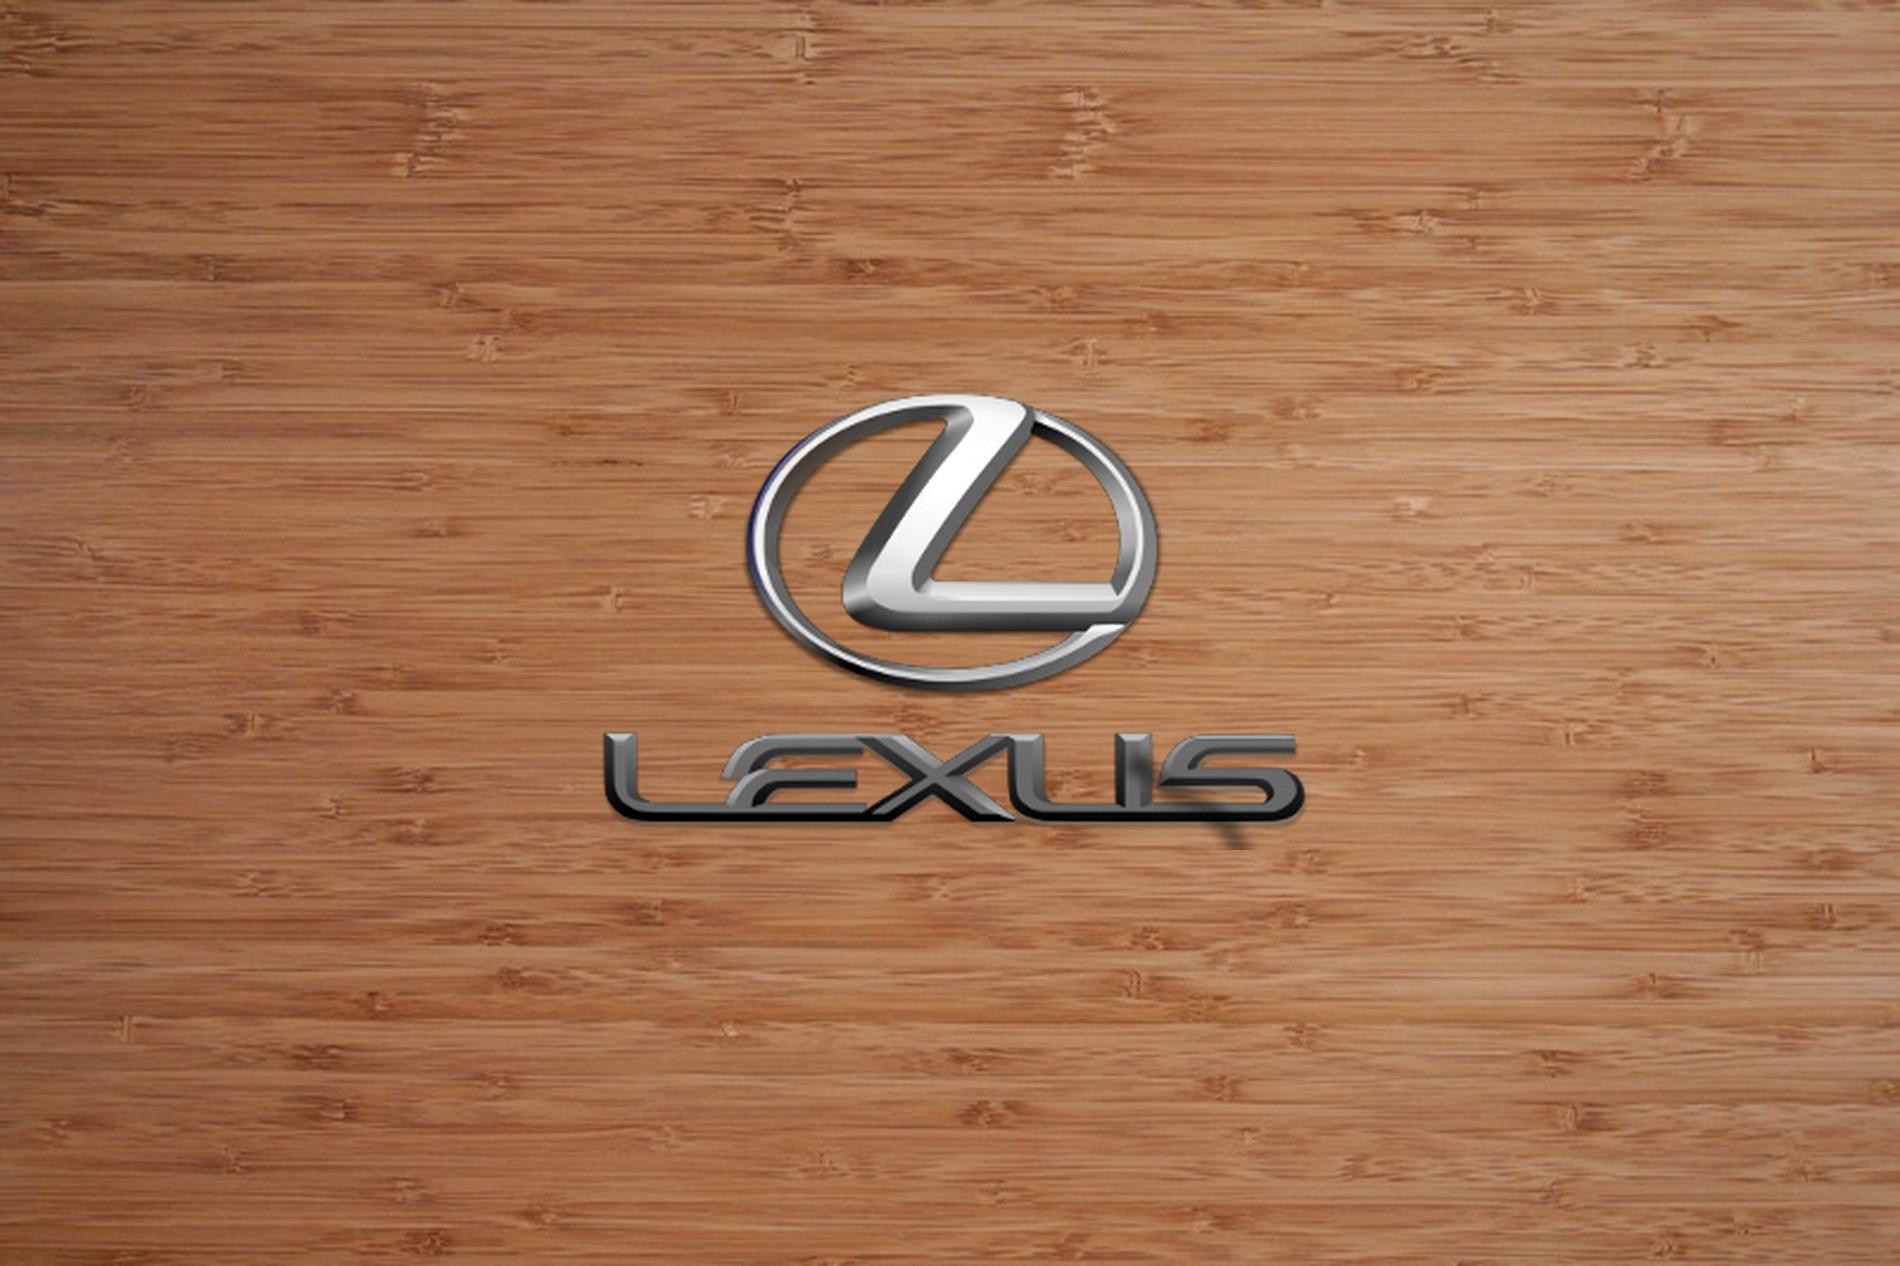 меня картинки логотип лексус переплывают